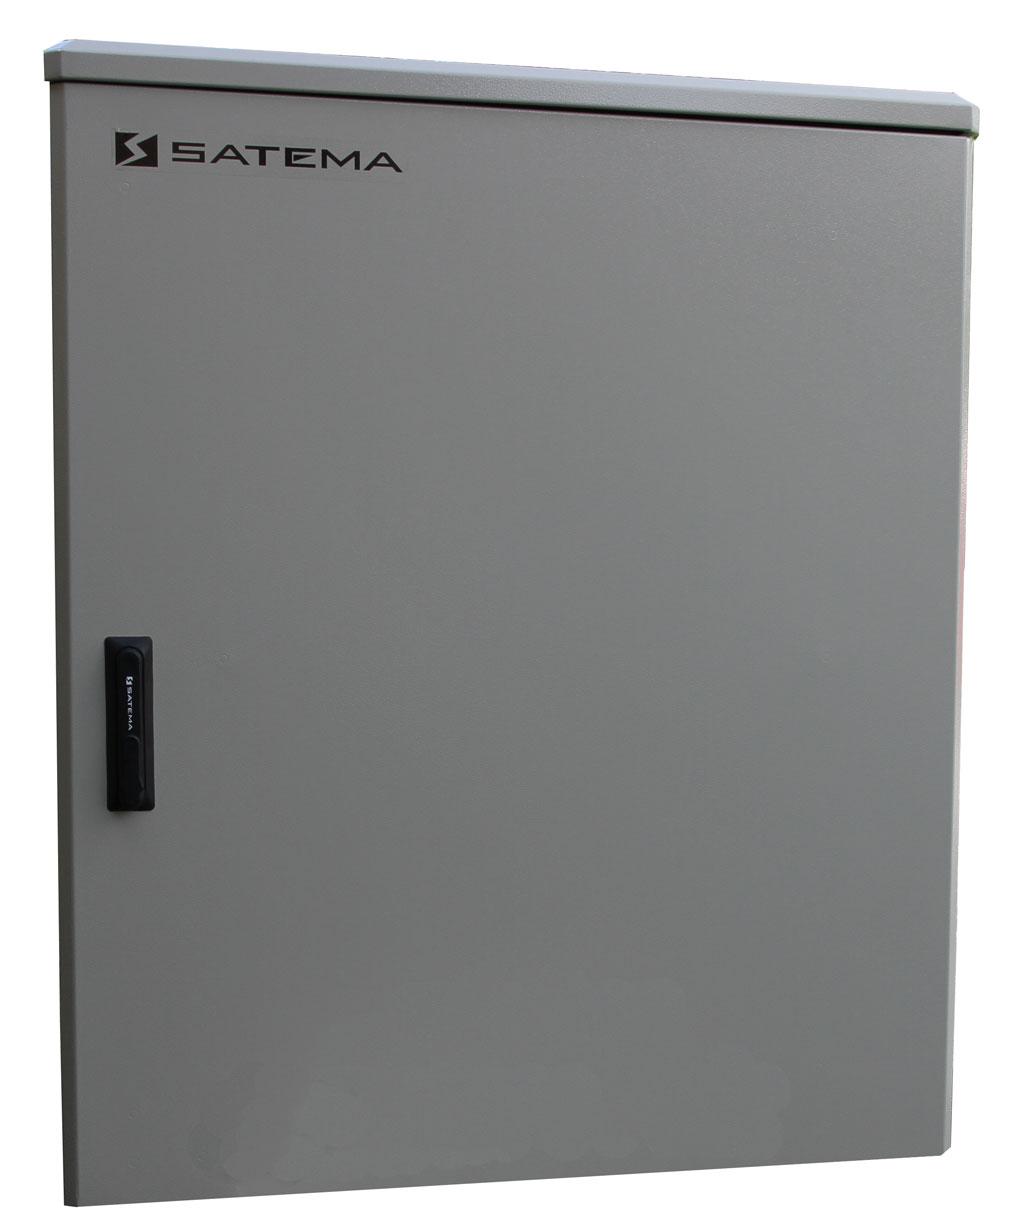 Dubbelvaggiga-Aluminiumskap-1000x1200x400